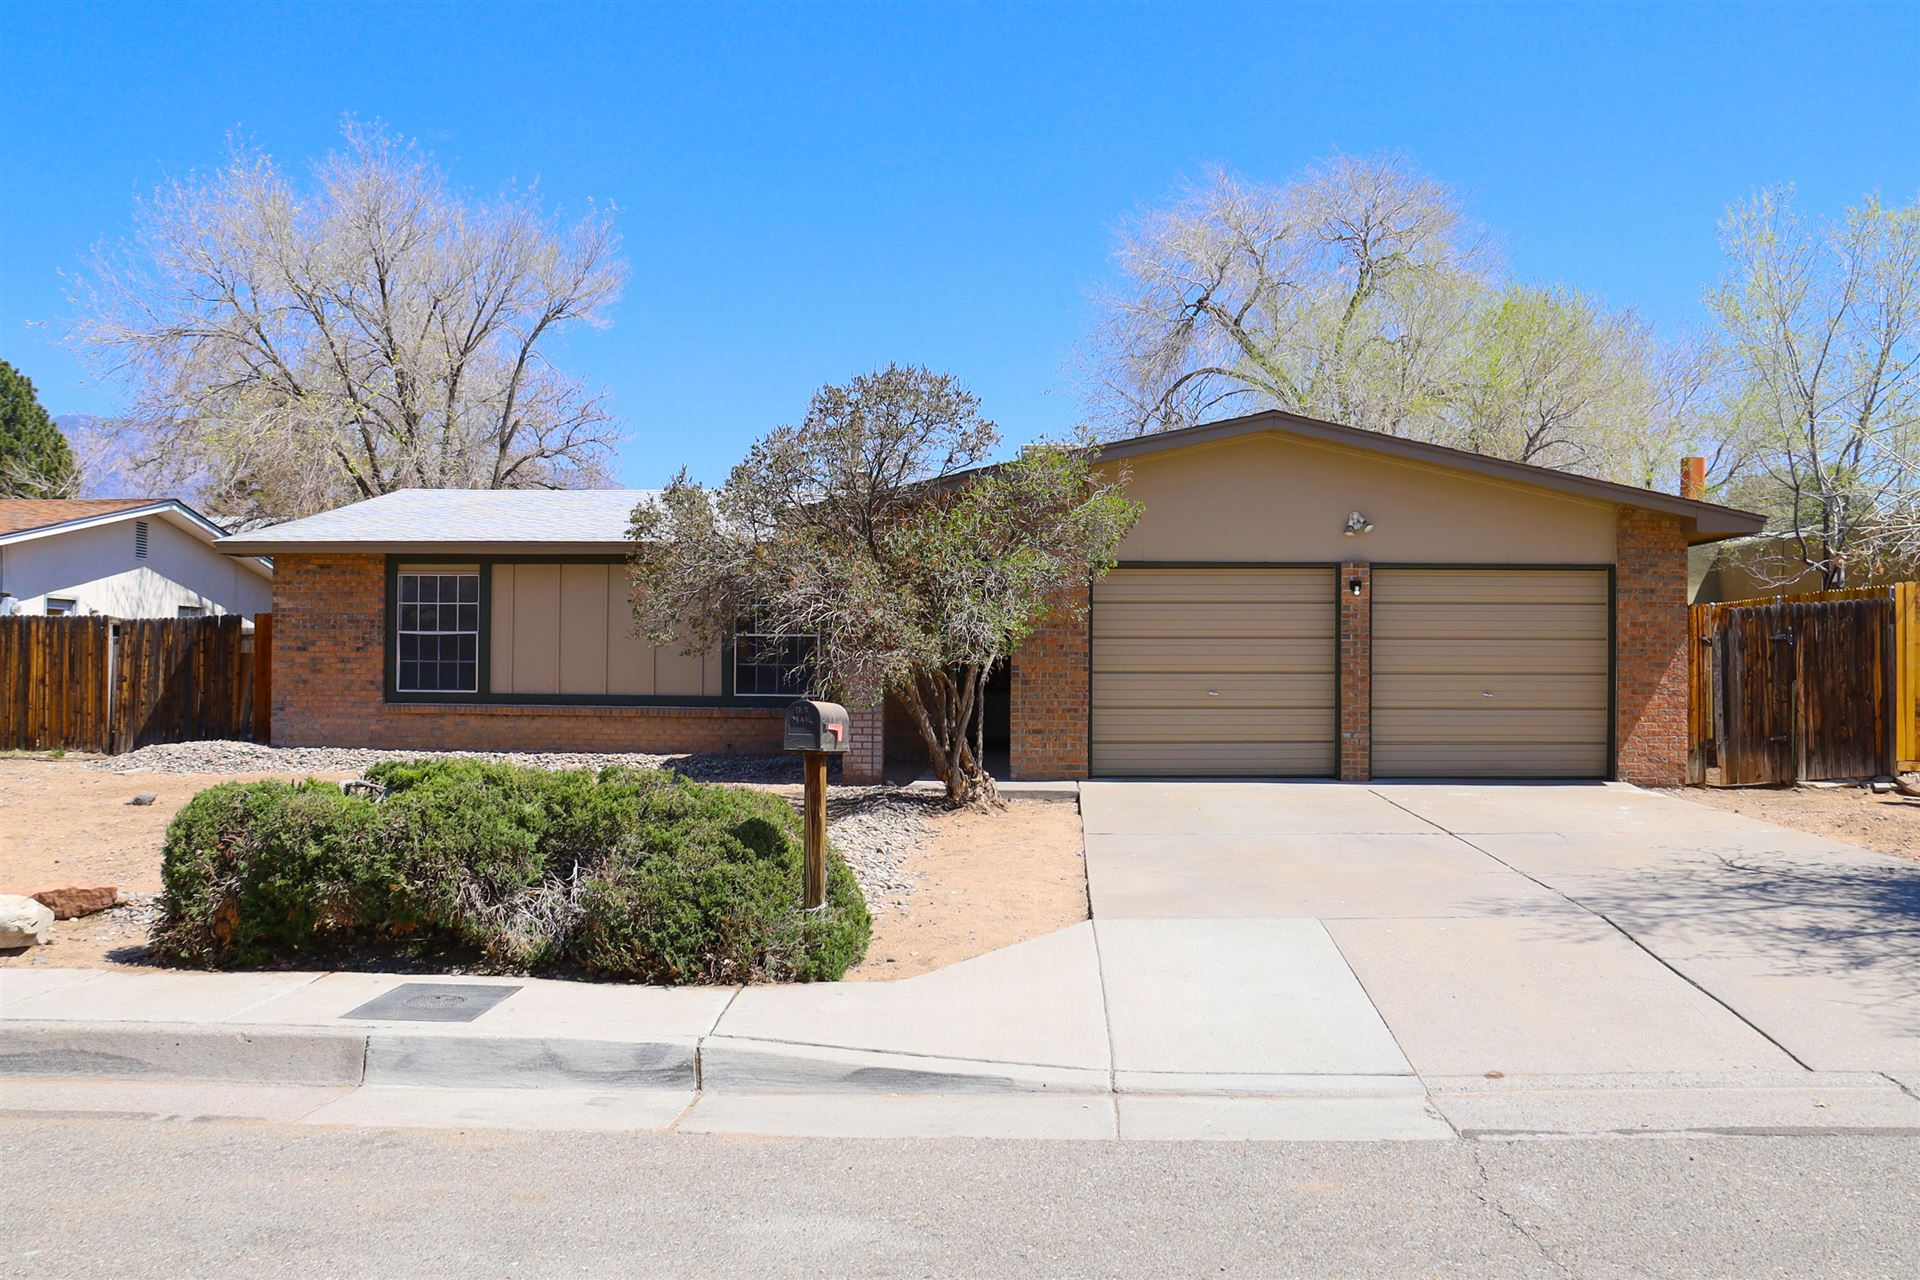 7104 LEONA Street NE, Albuquerque, NM 87109 - MLS#: 988971